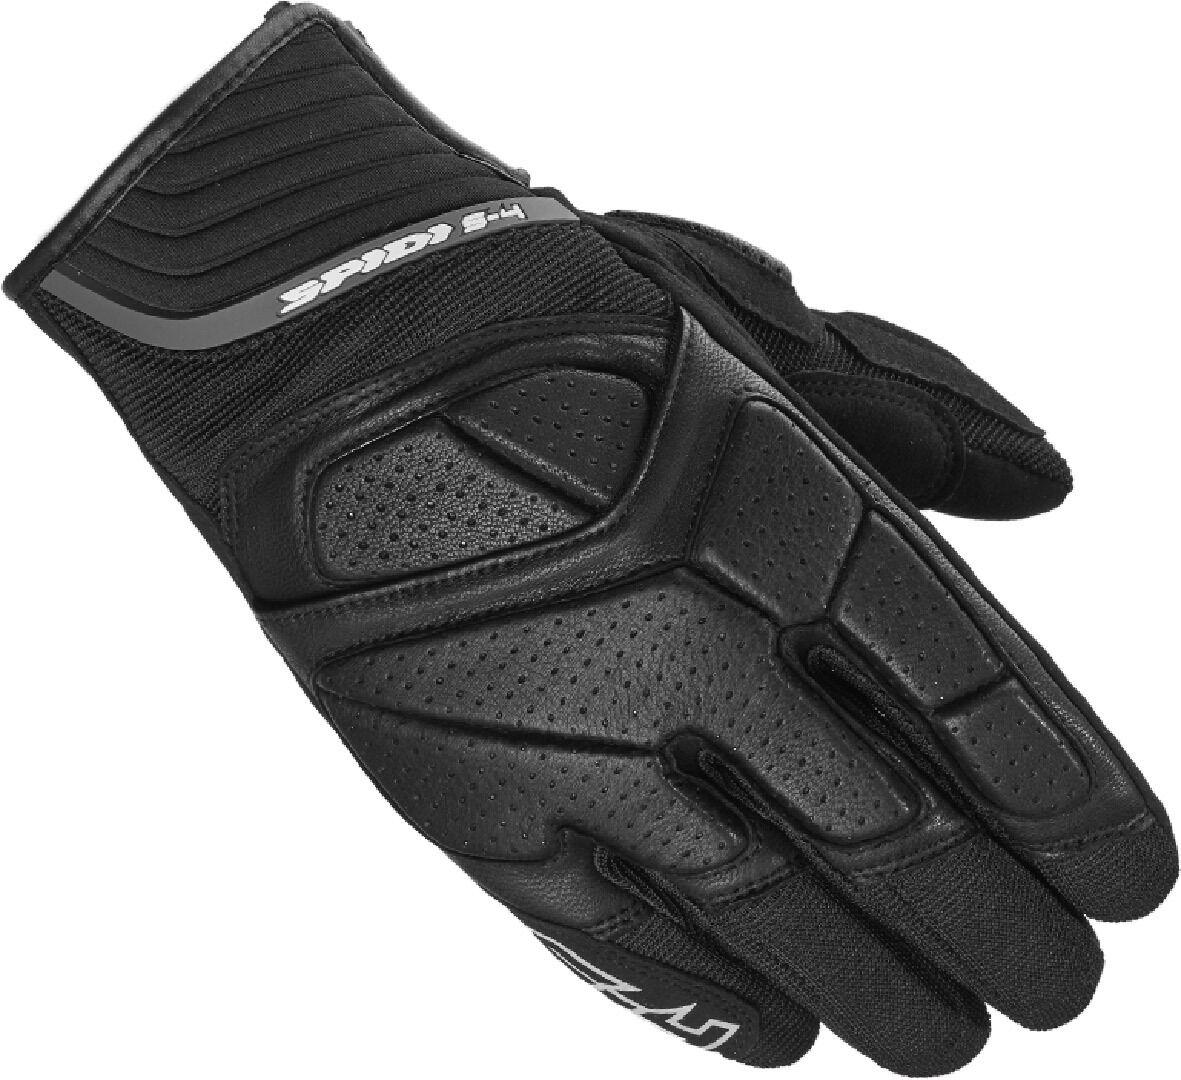 Spidi S-4 Gloves Black XL